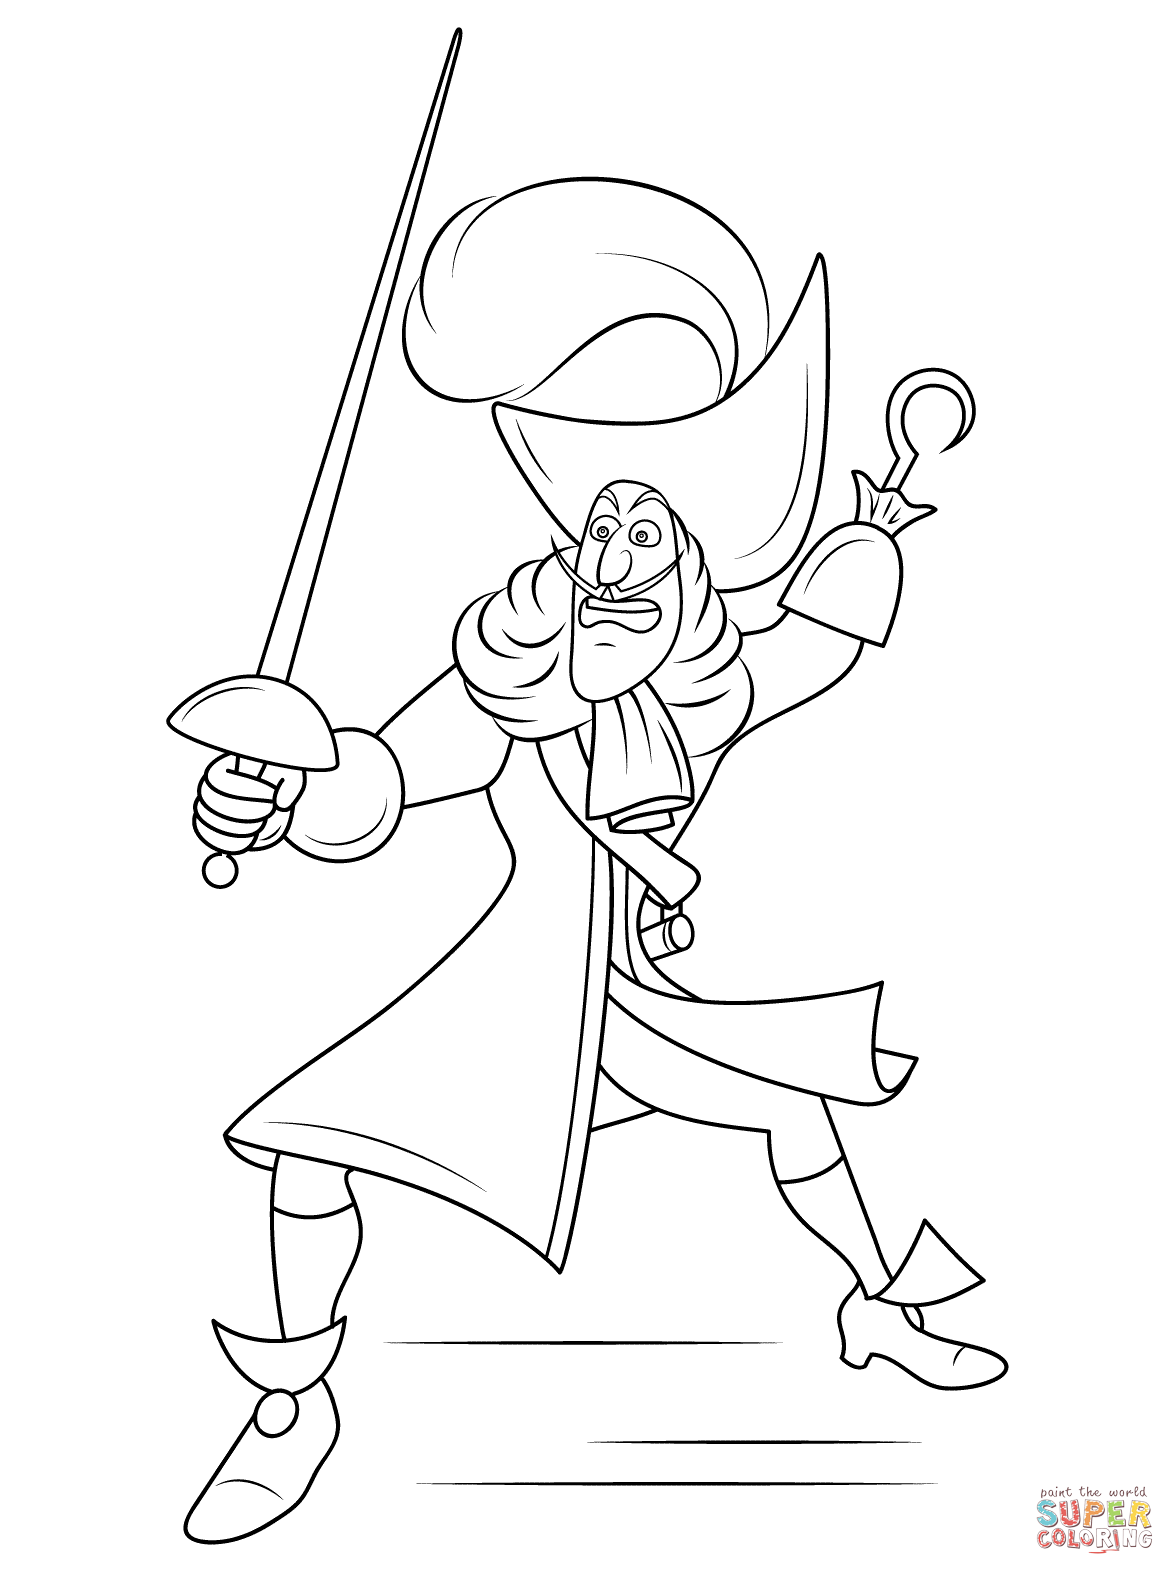 captain hook drawing at getdrawings  free download